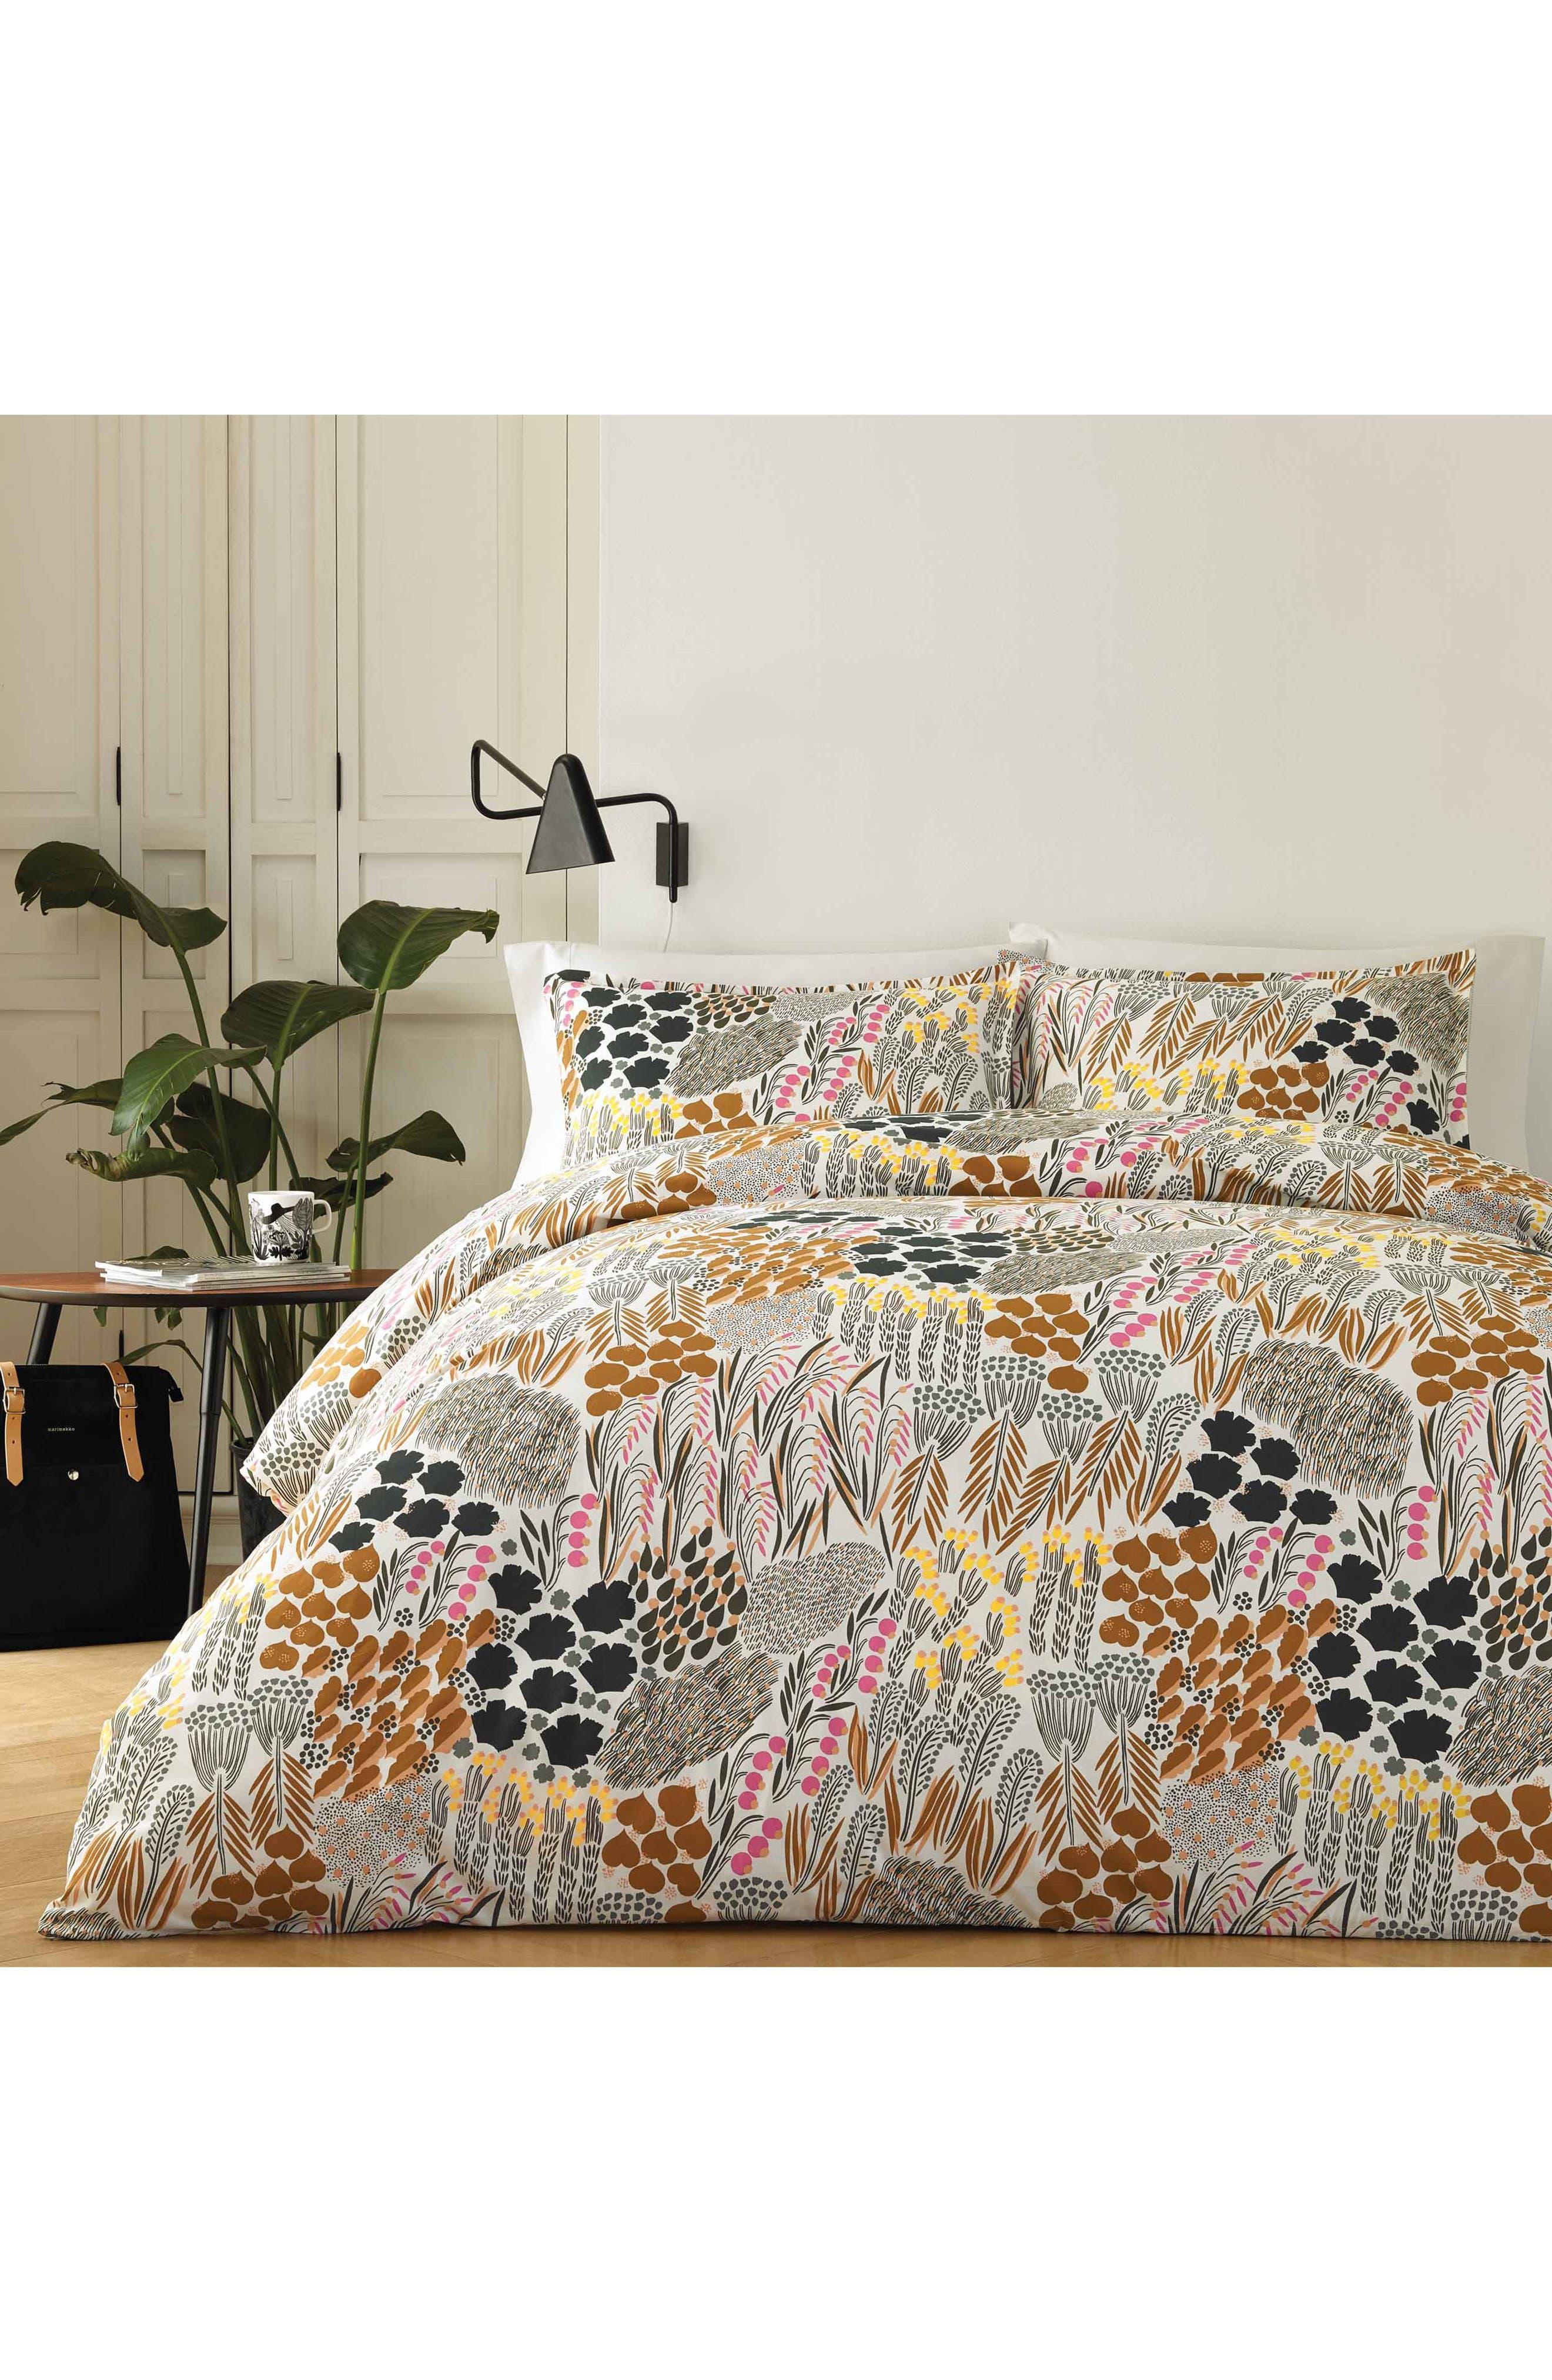 marimekko pieni letto comforter u0026 sham set - Marimekko Bedding